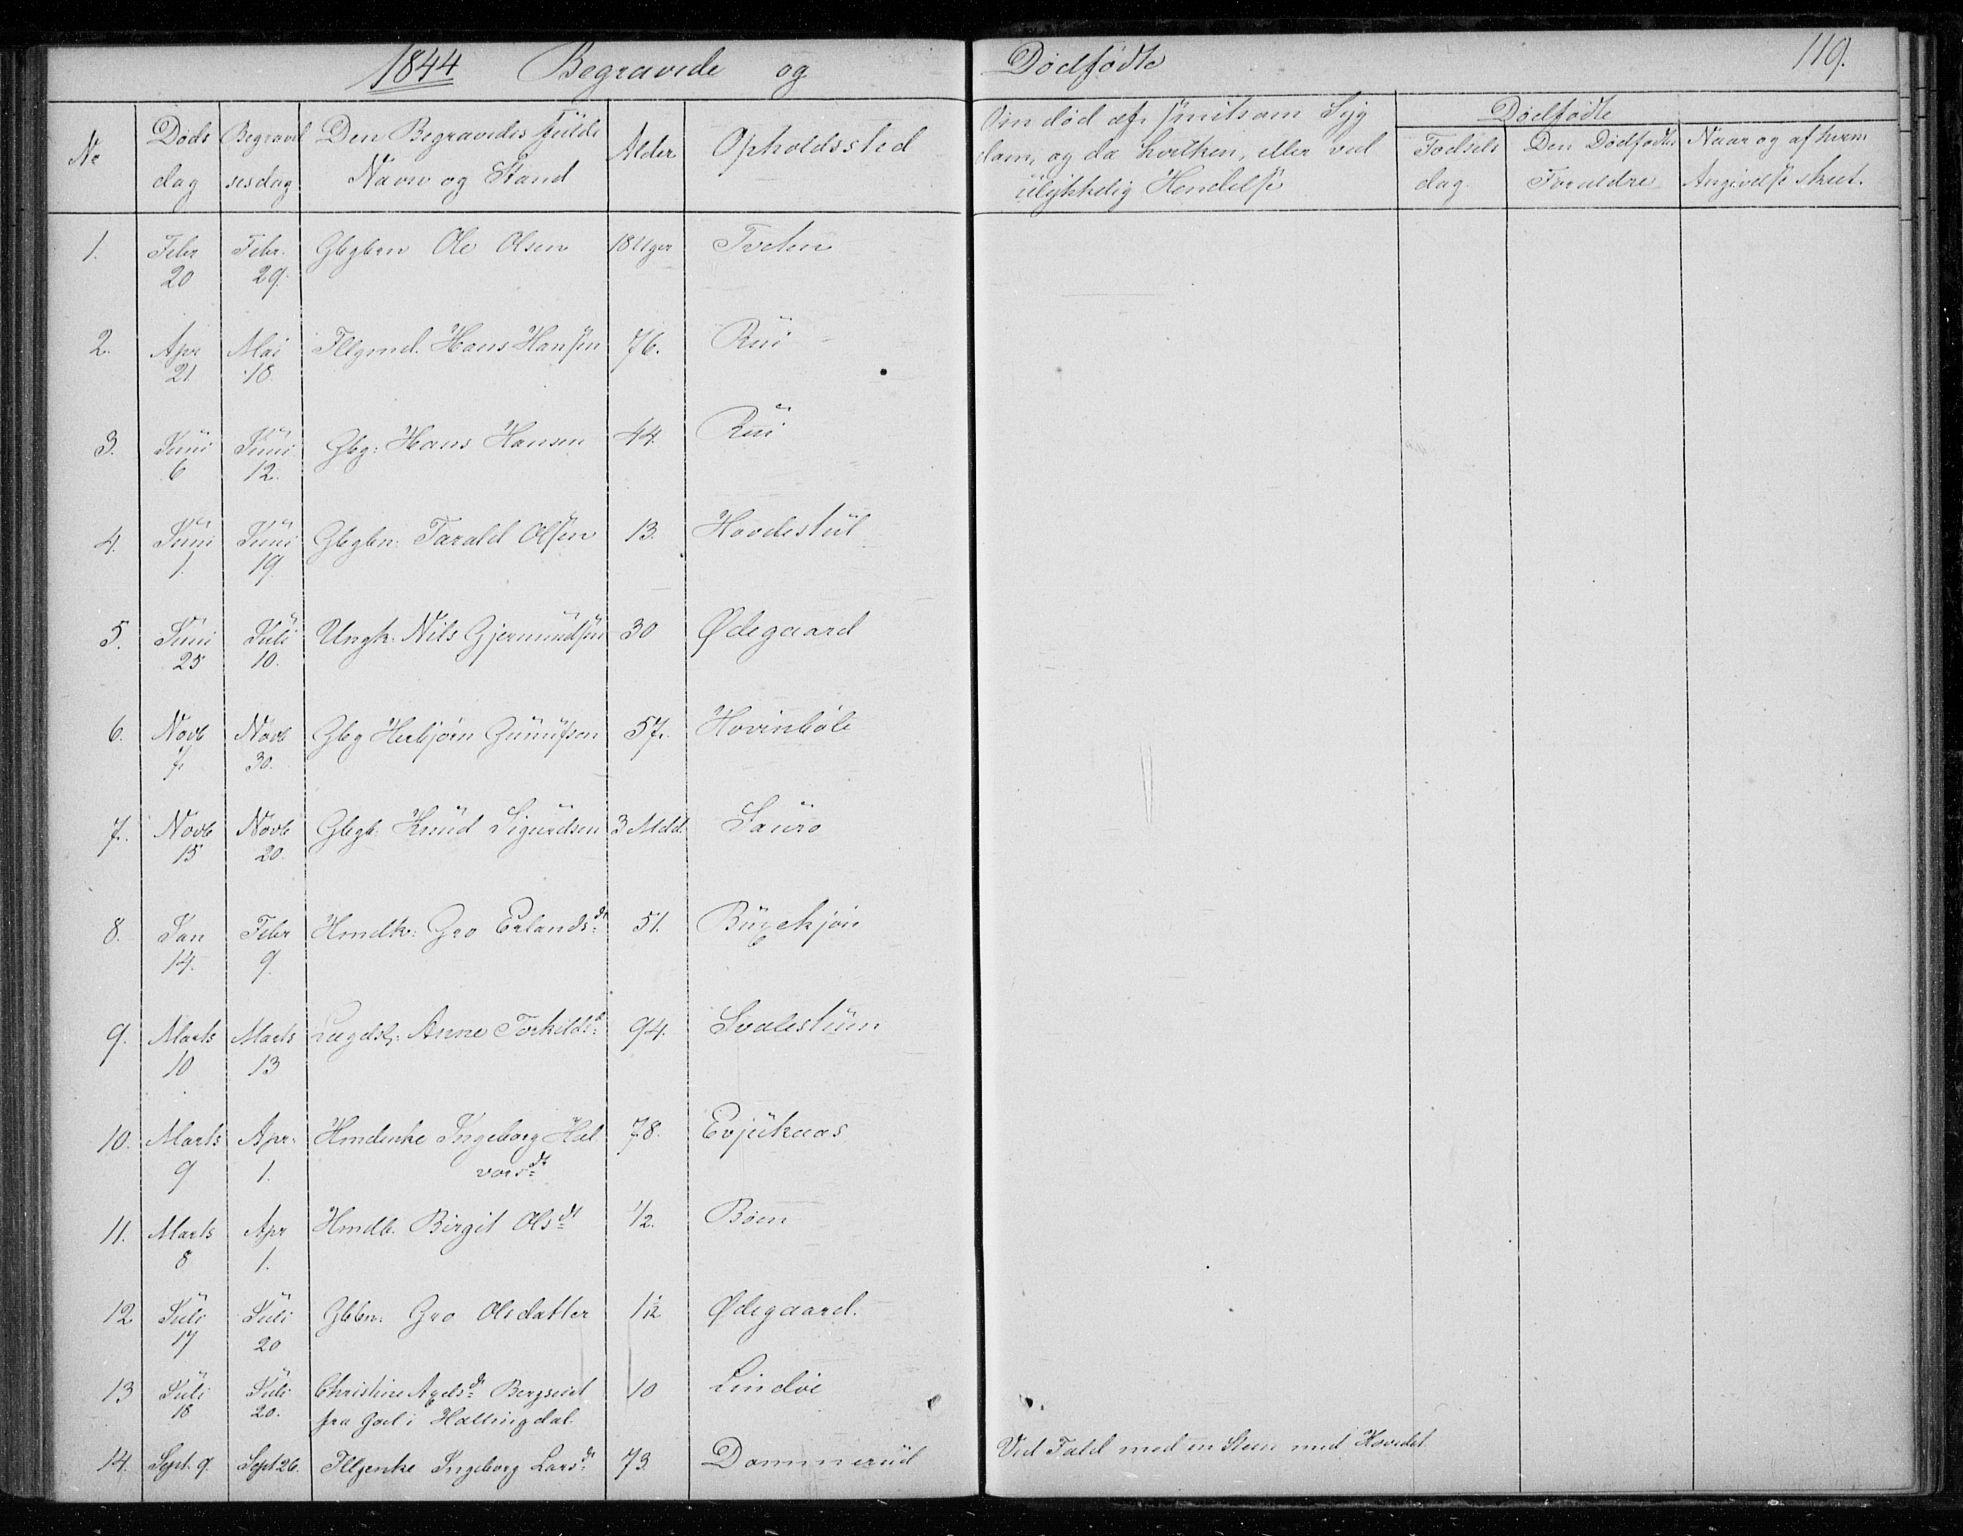 SAKO, Gransherad kirkebøker, F/Fb/L0003: Ministerialbok nr. II 3, 1844-1859, s. 119